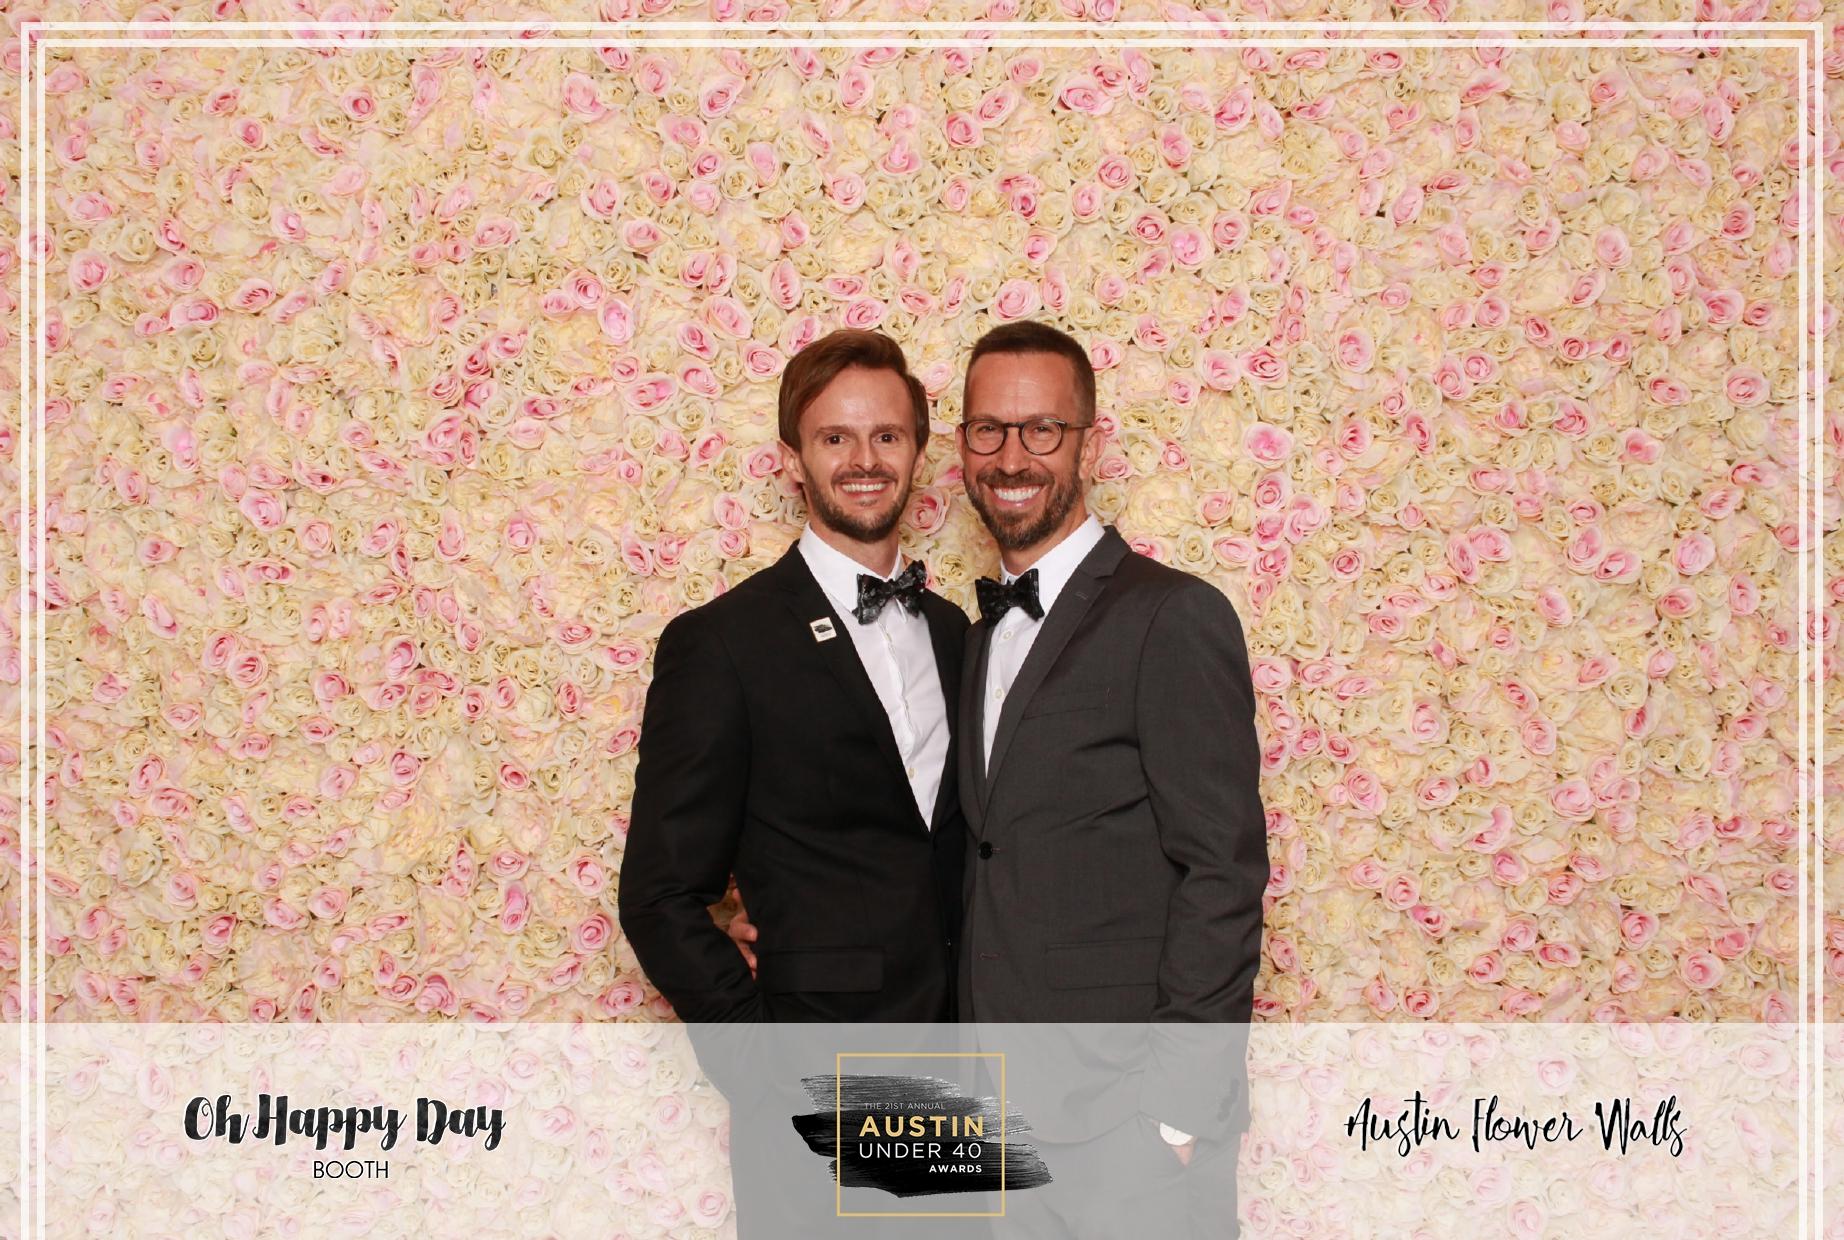 Oh Happy Day Booth - Austin Under 40-104.jpg